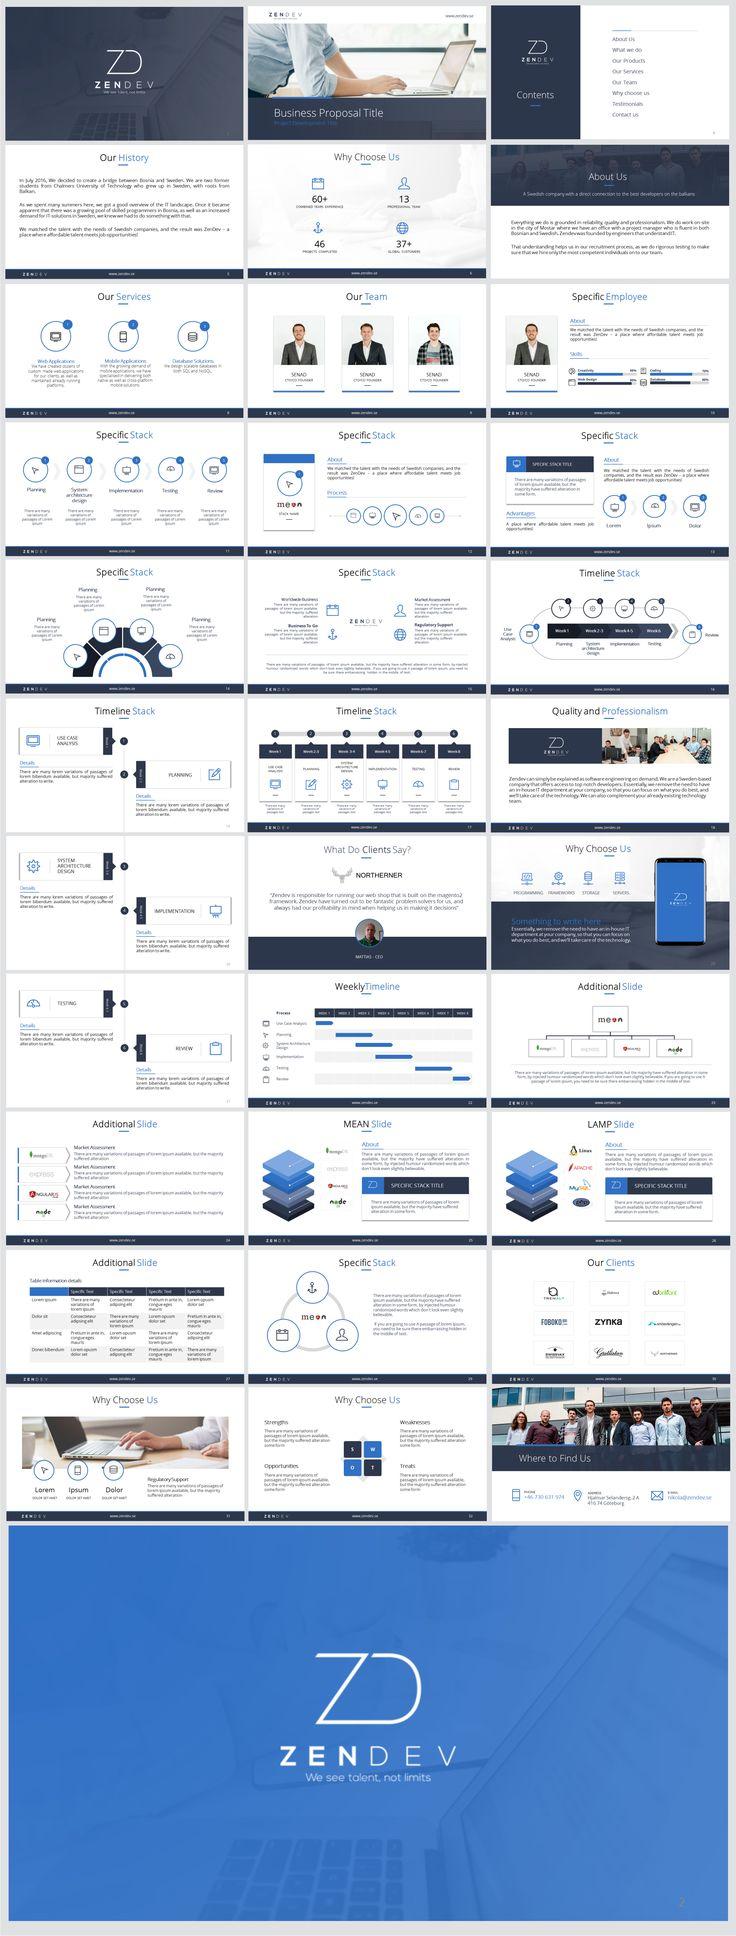 The 25 best slideshow presentation ideas on pinterest ppt design slide design presentation design brochure template editorial design brochures templates role models editorial layout toneelgroepblik Choice Image